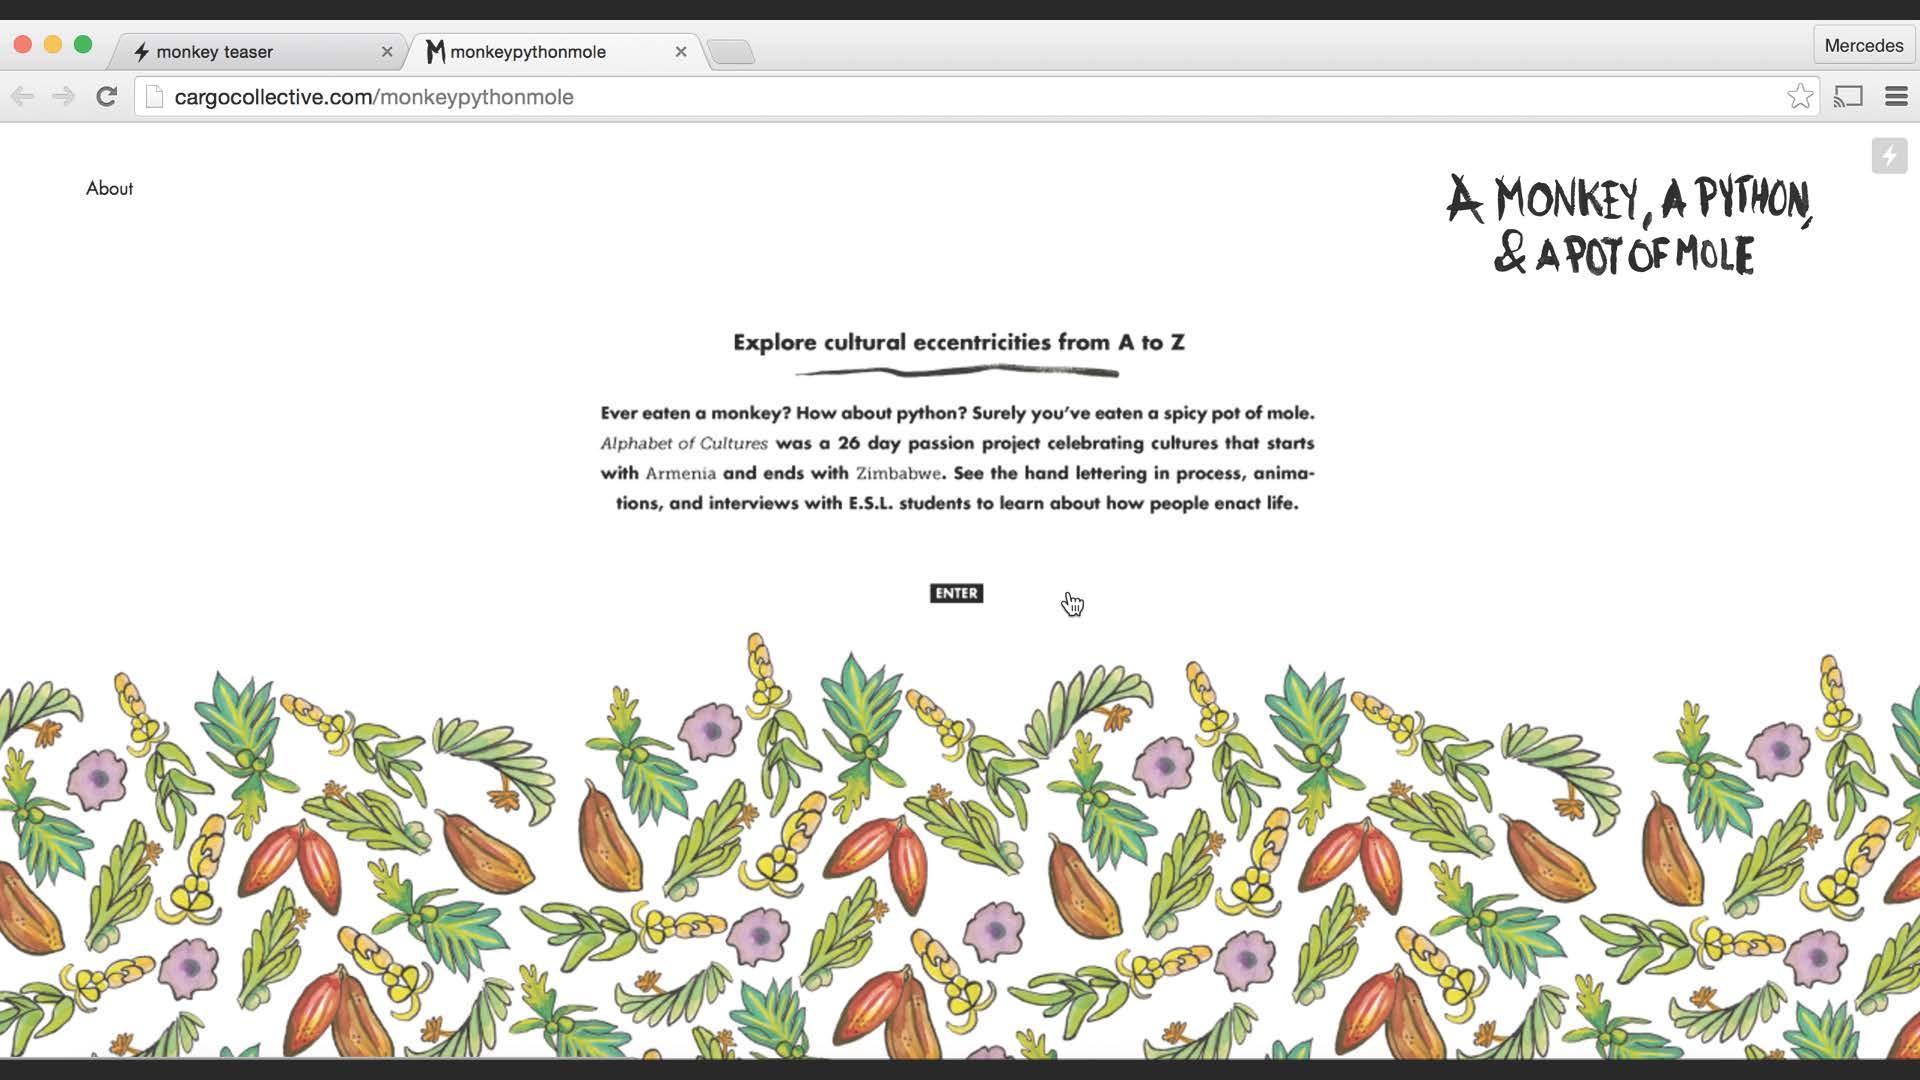 alphabetcultures_mercedes.jpg